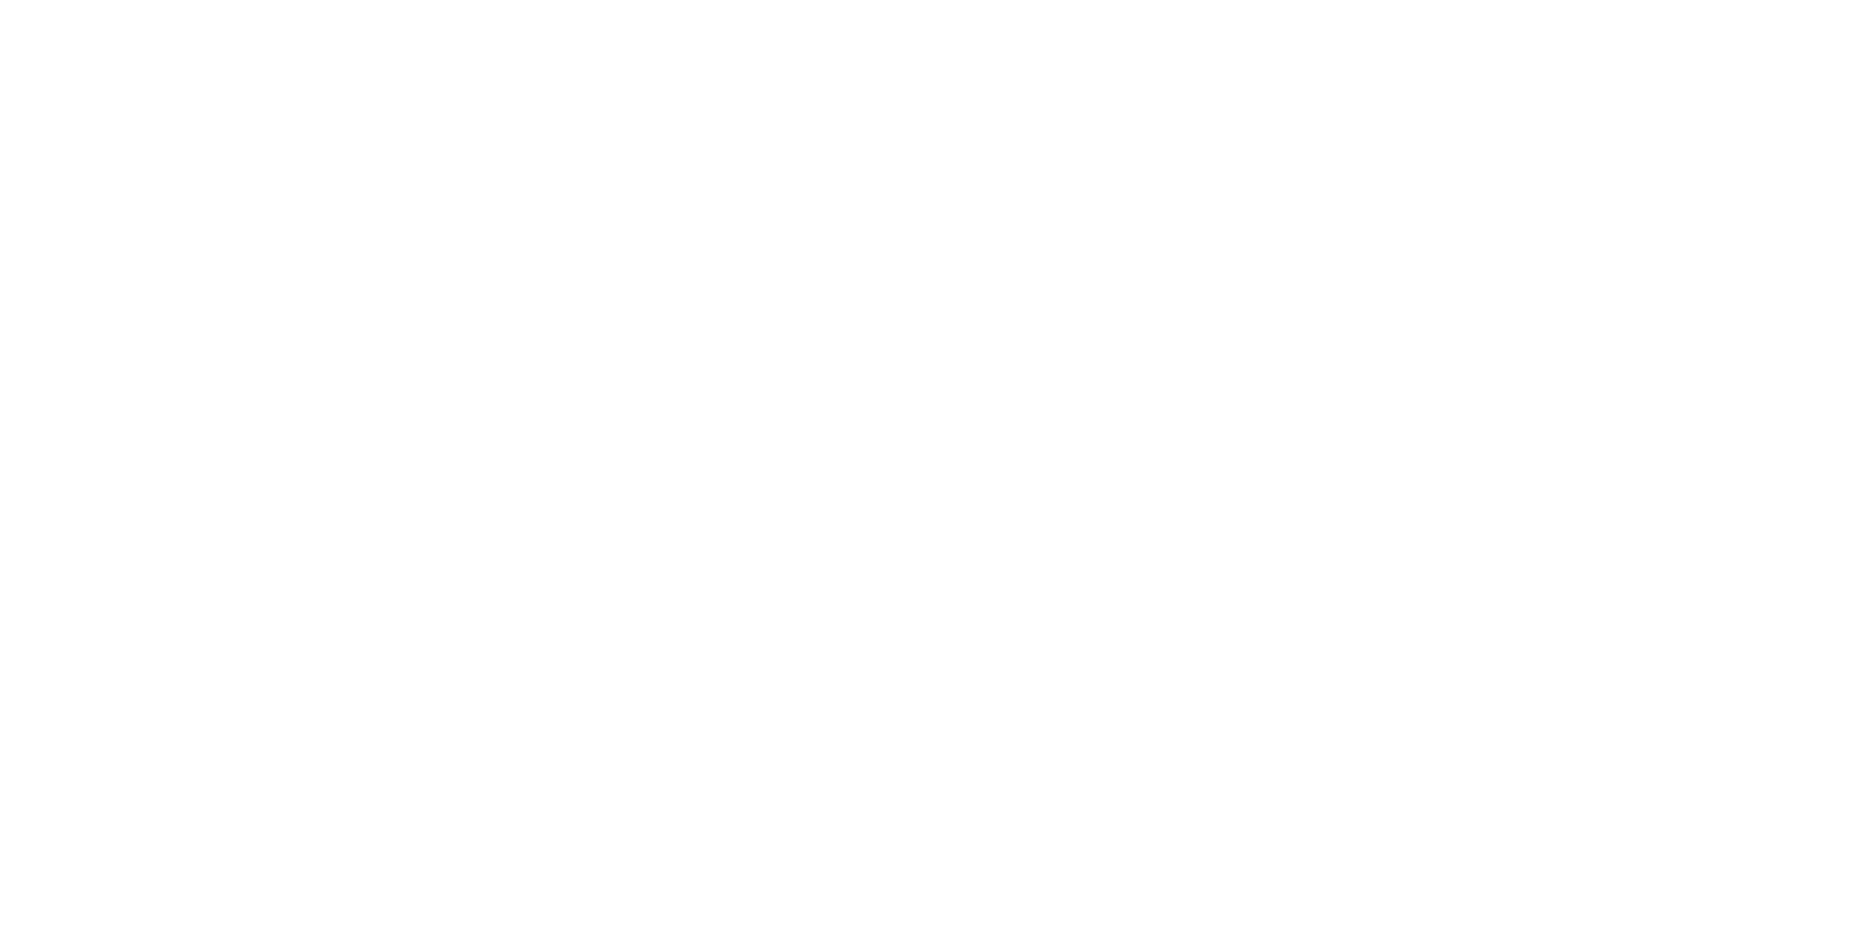 logo-design-9